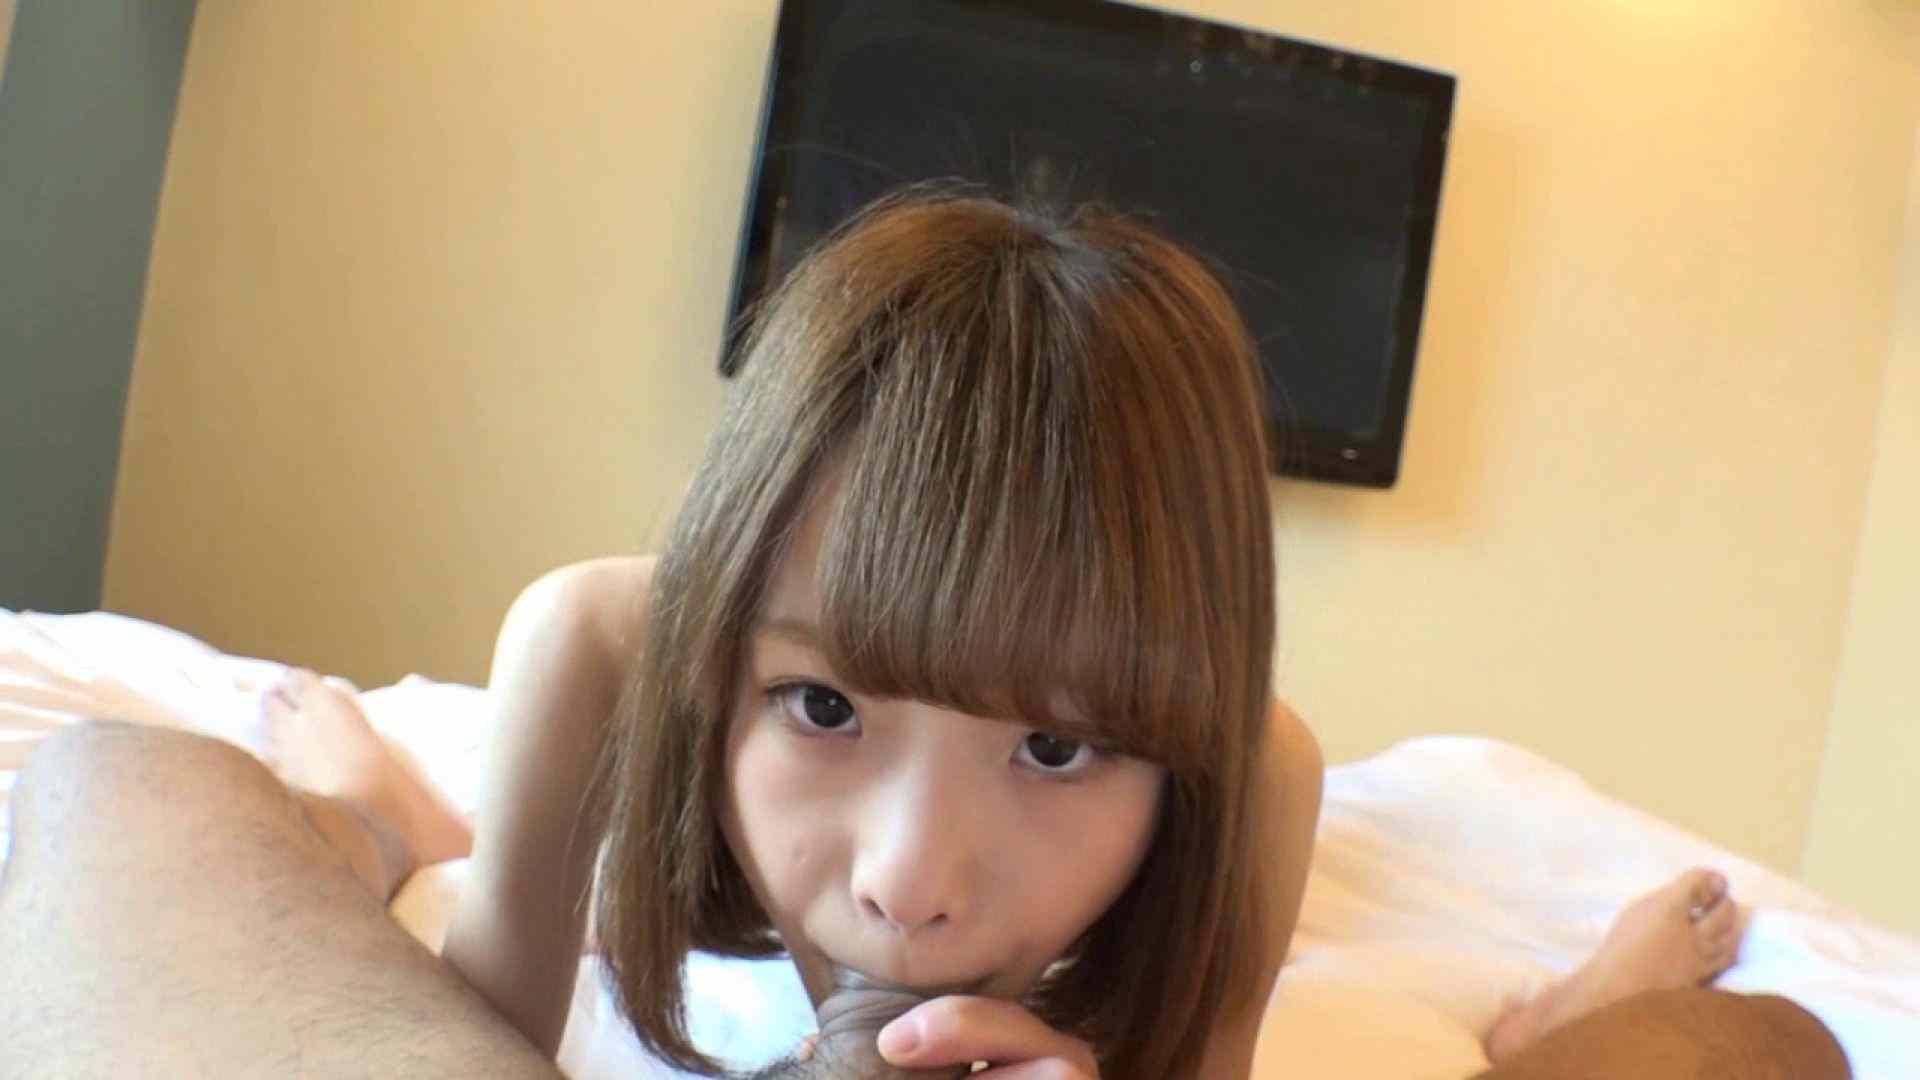 S級厳選美女ビッチガールVol.32 前編 美女 | ギャルライフ  58pic 12